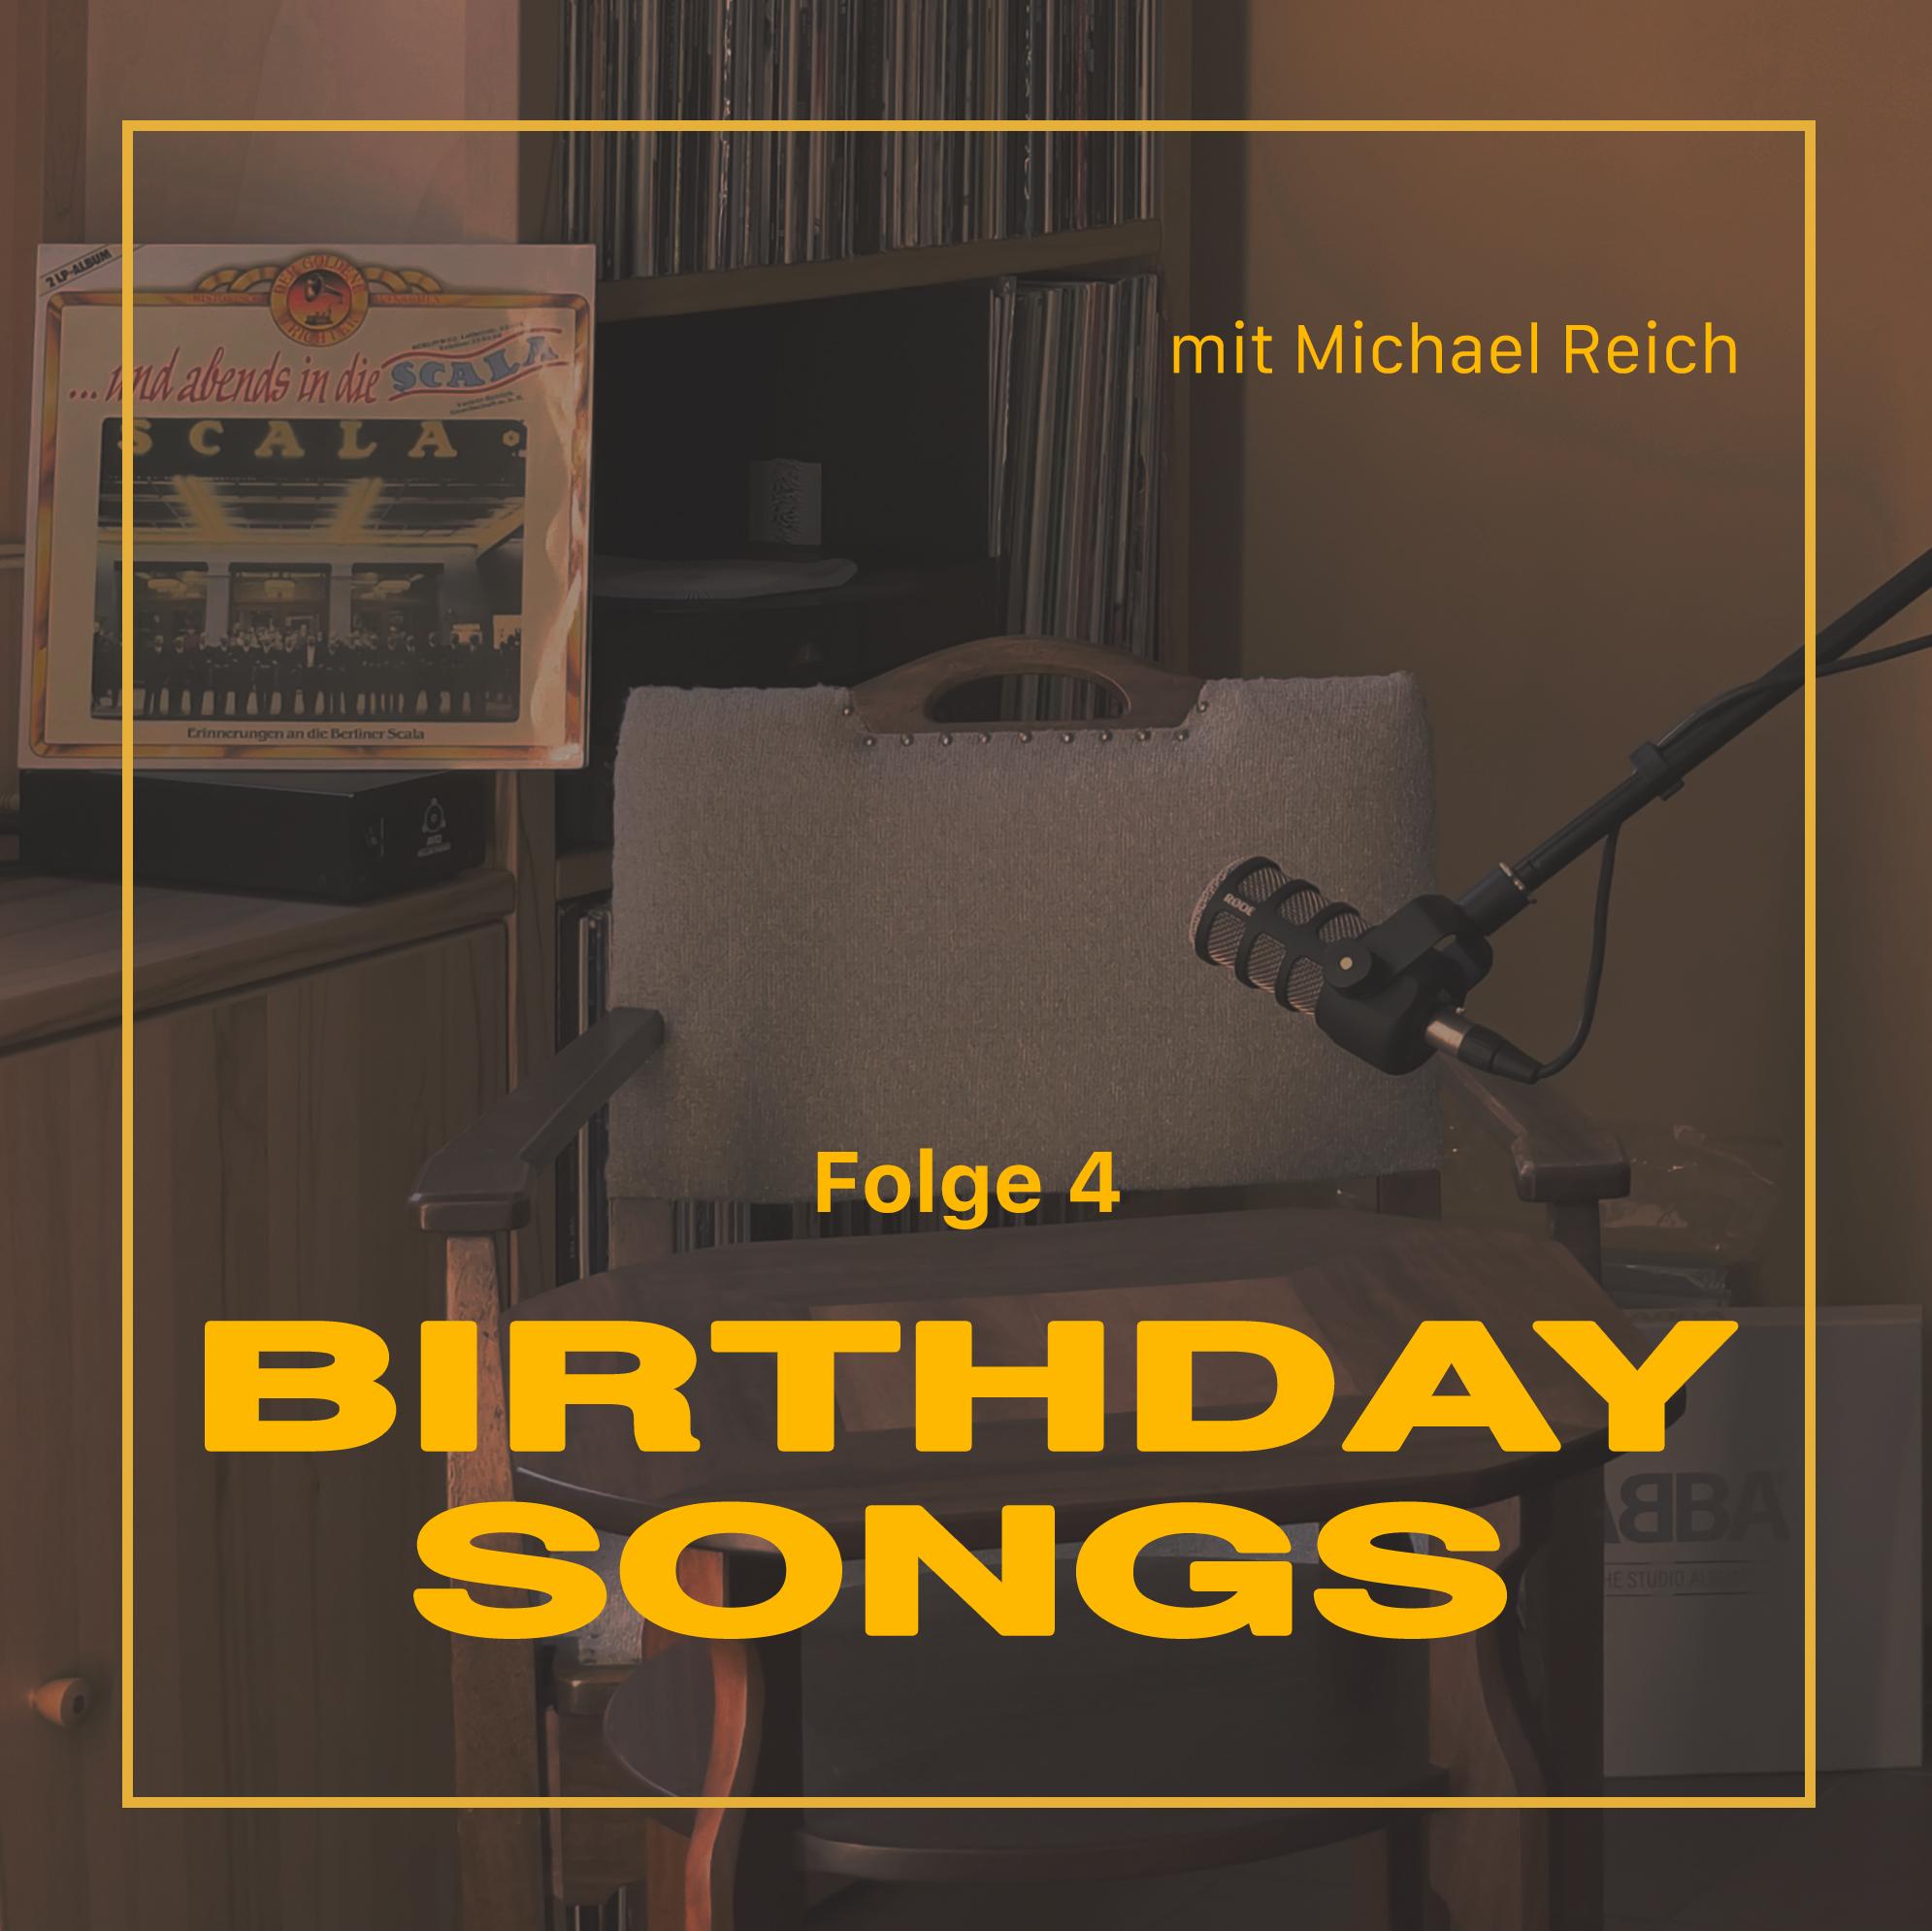 Birthday Songs Folge 4